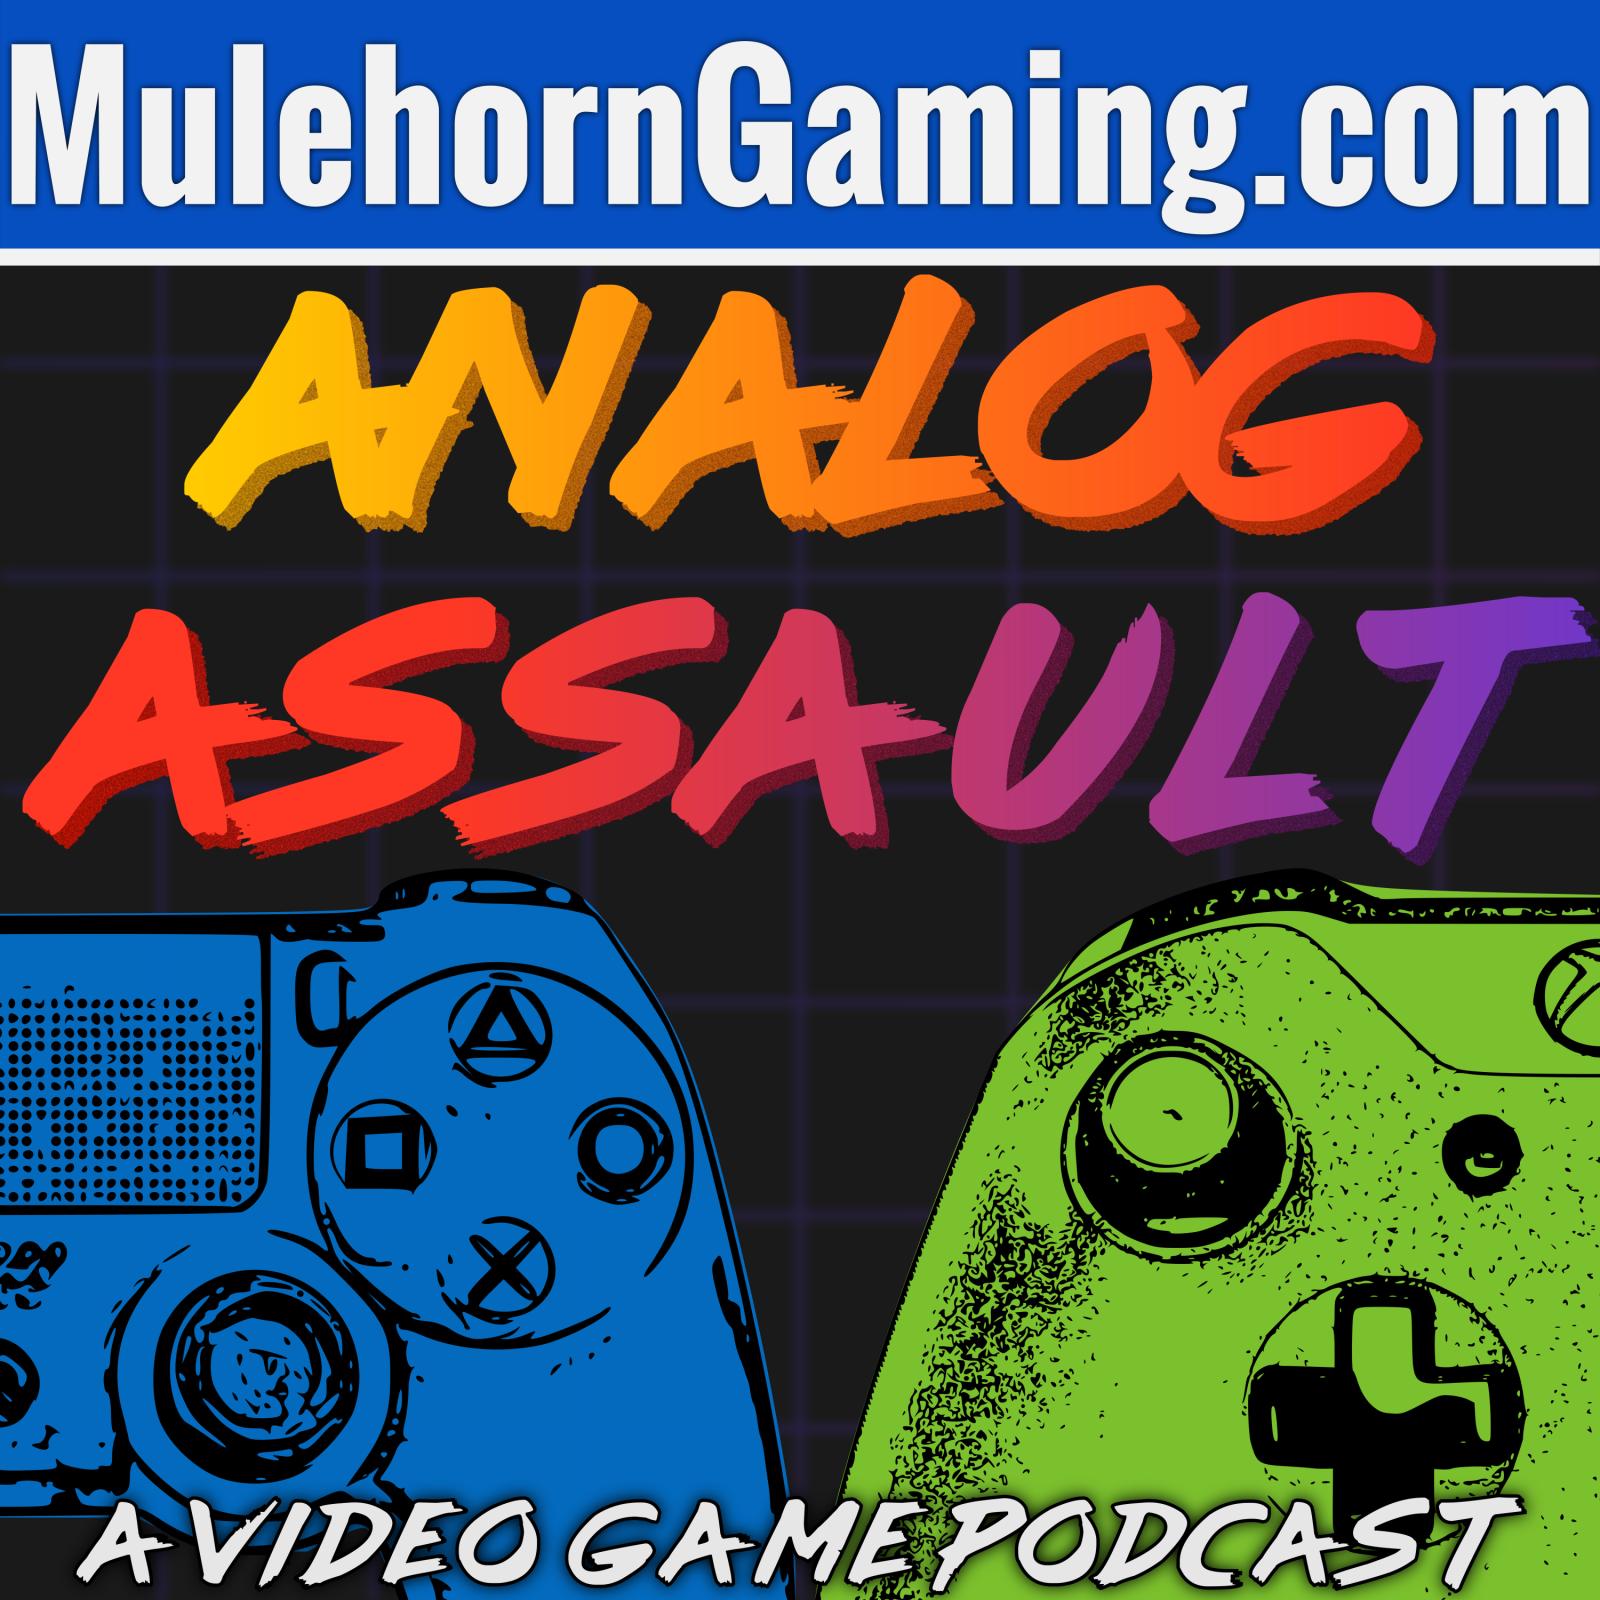 Analog Assault Podcast